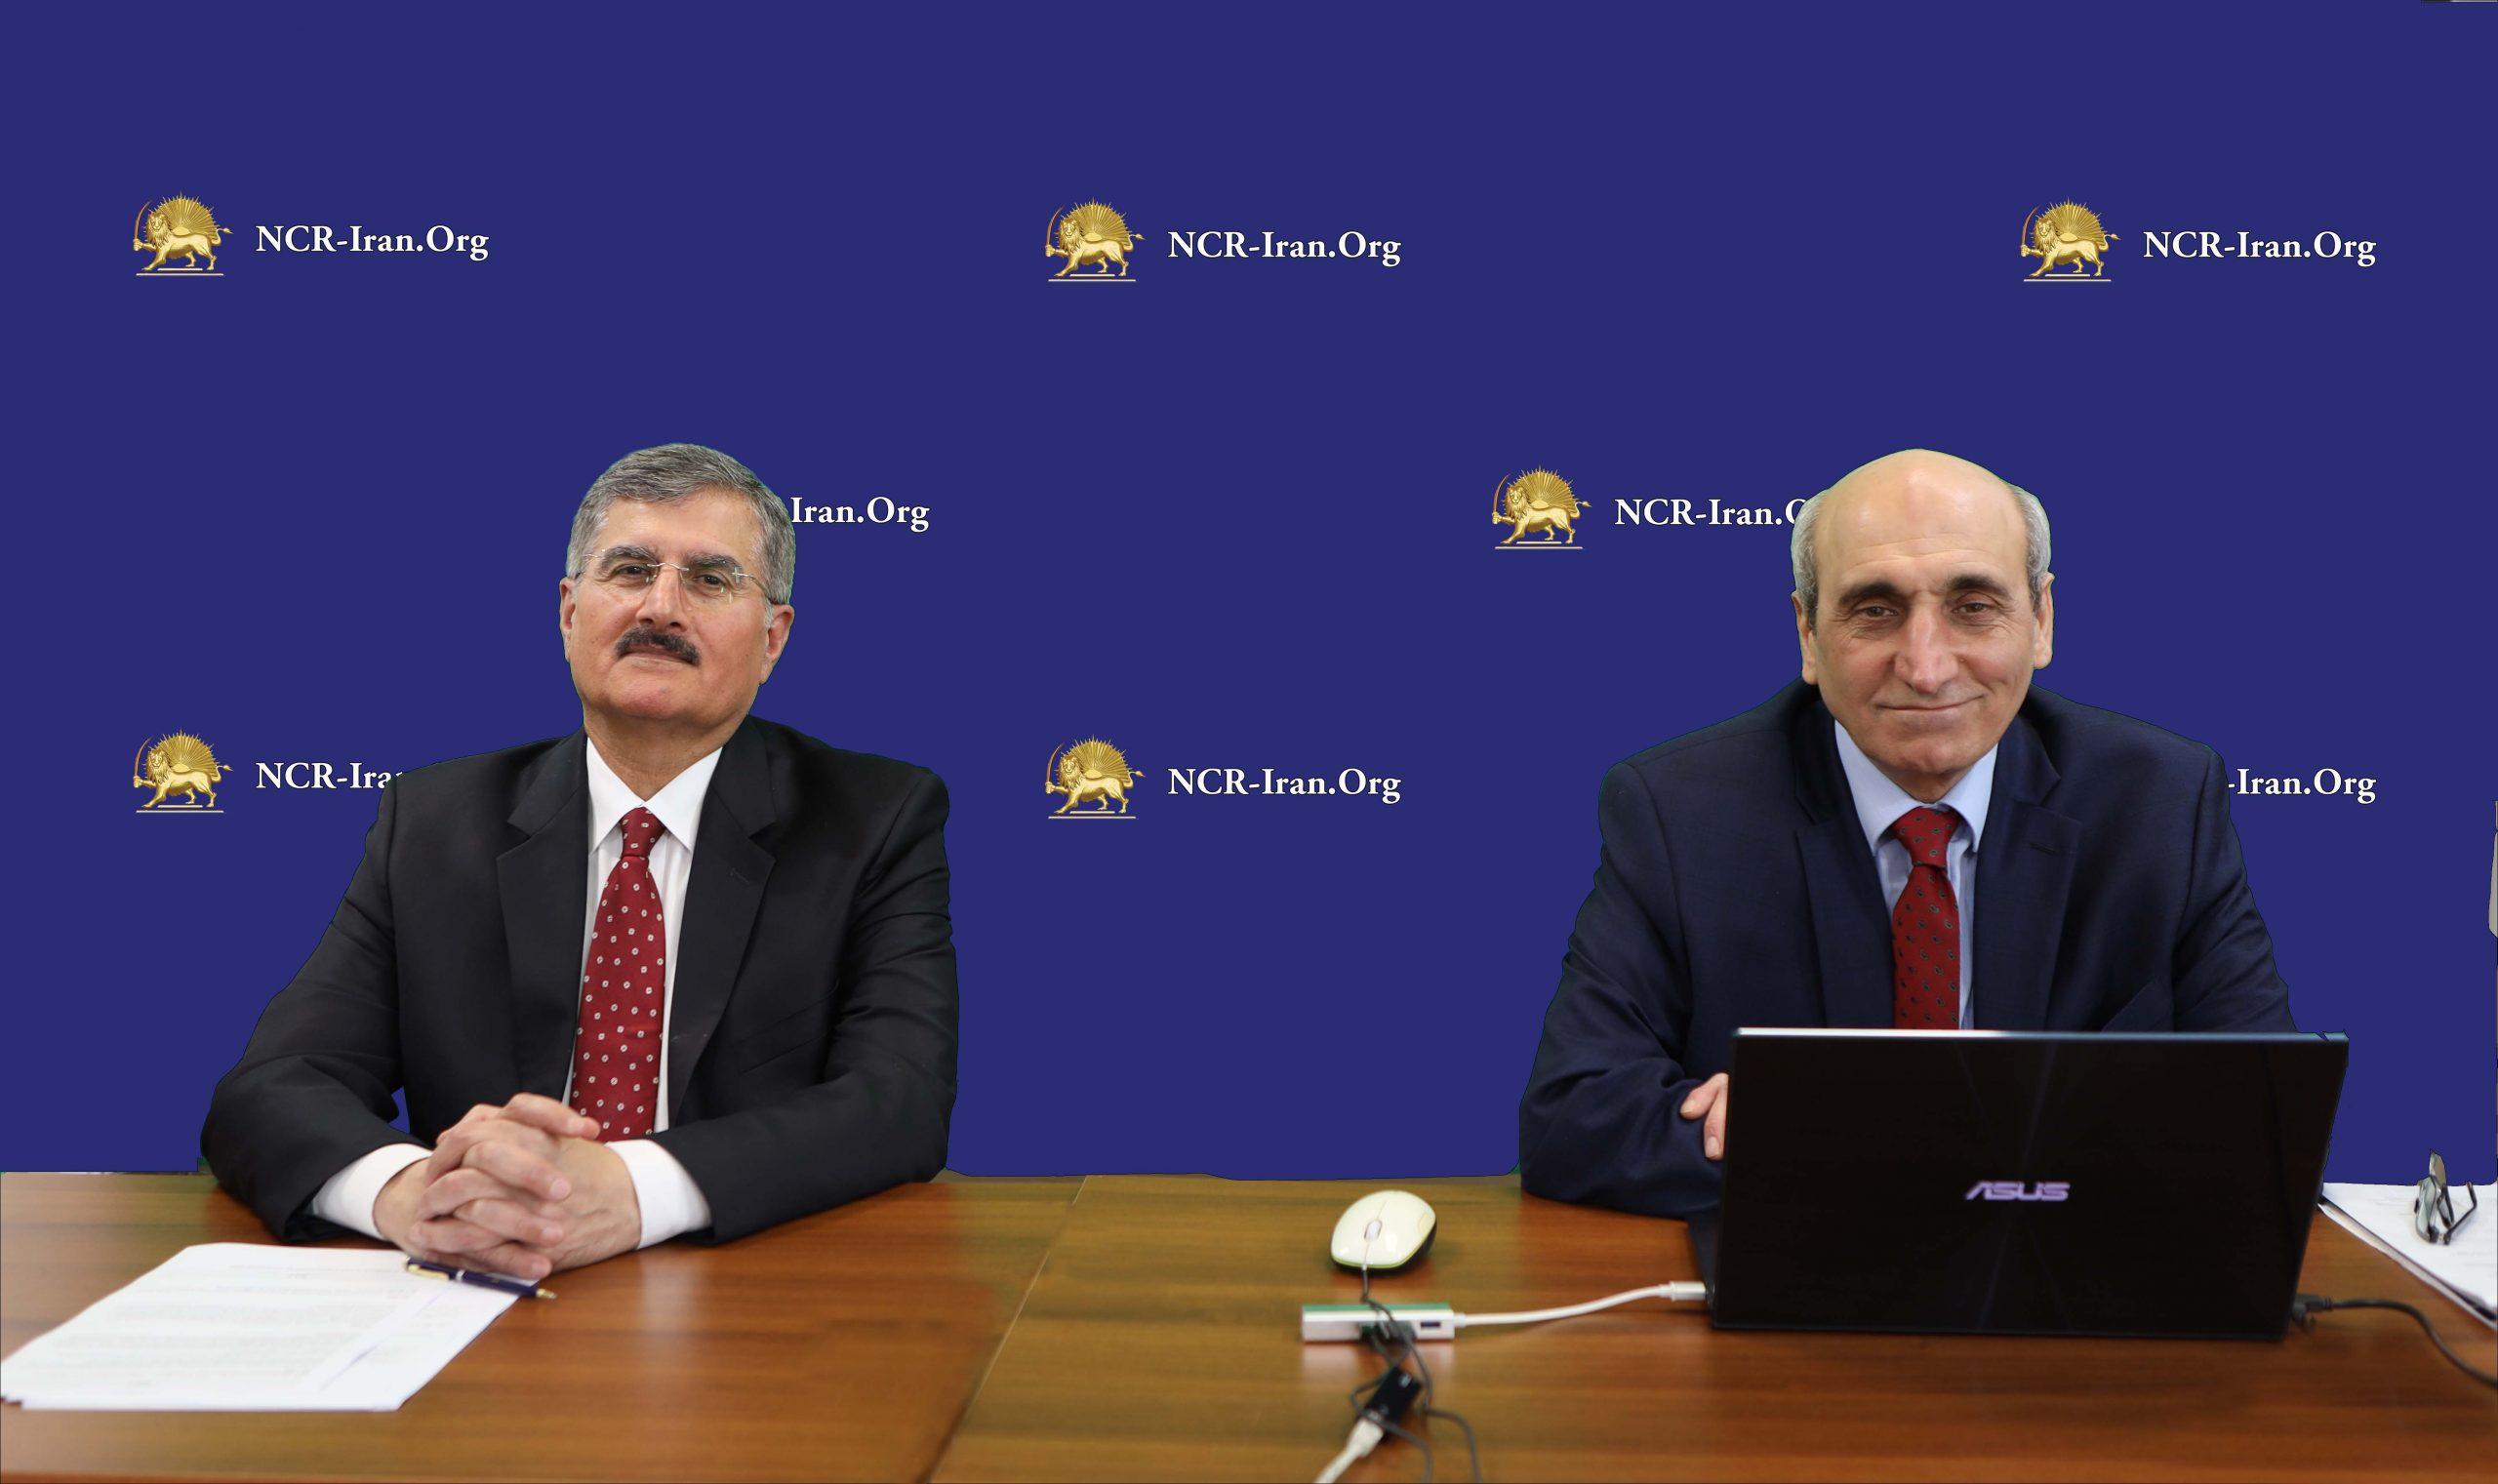 NCRI Webinar: Coronavirus catastrophe in Iran: Where are the resources to combat the crisis?